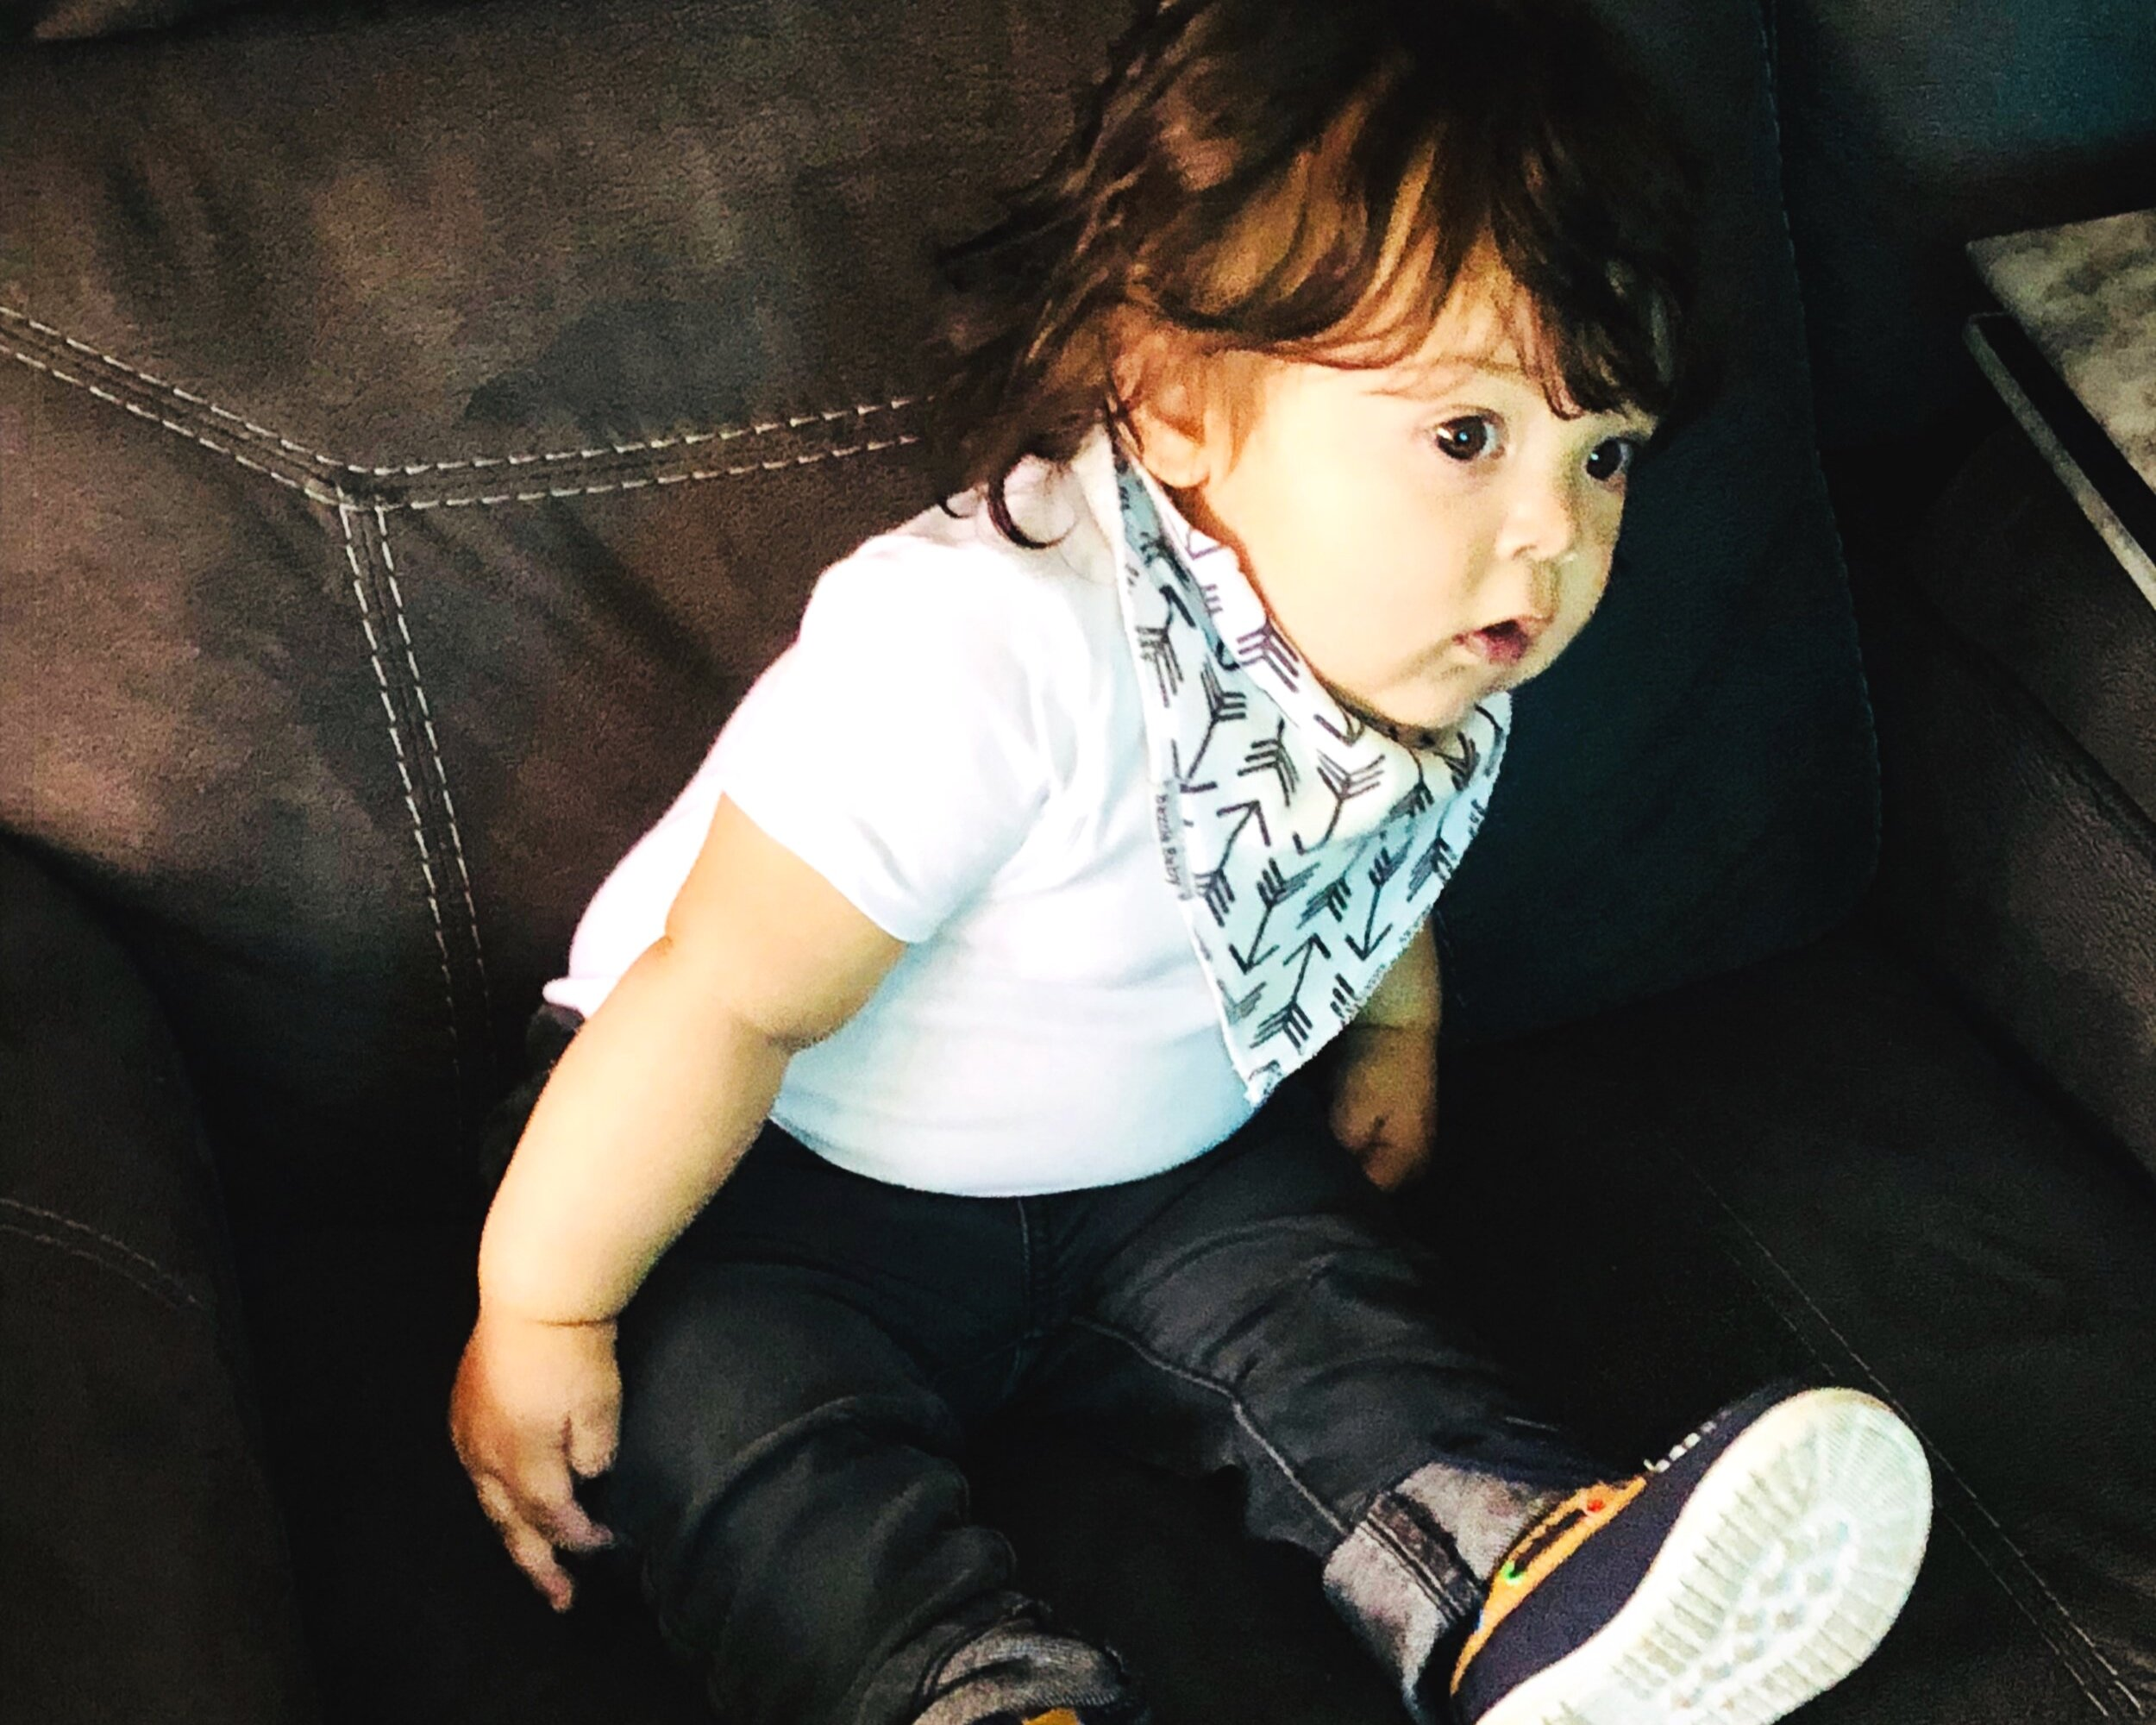 Lennox with bandana bib